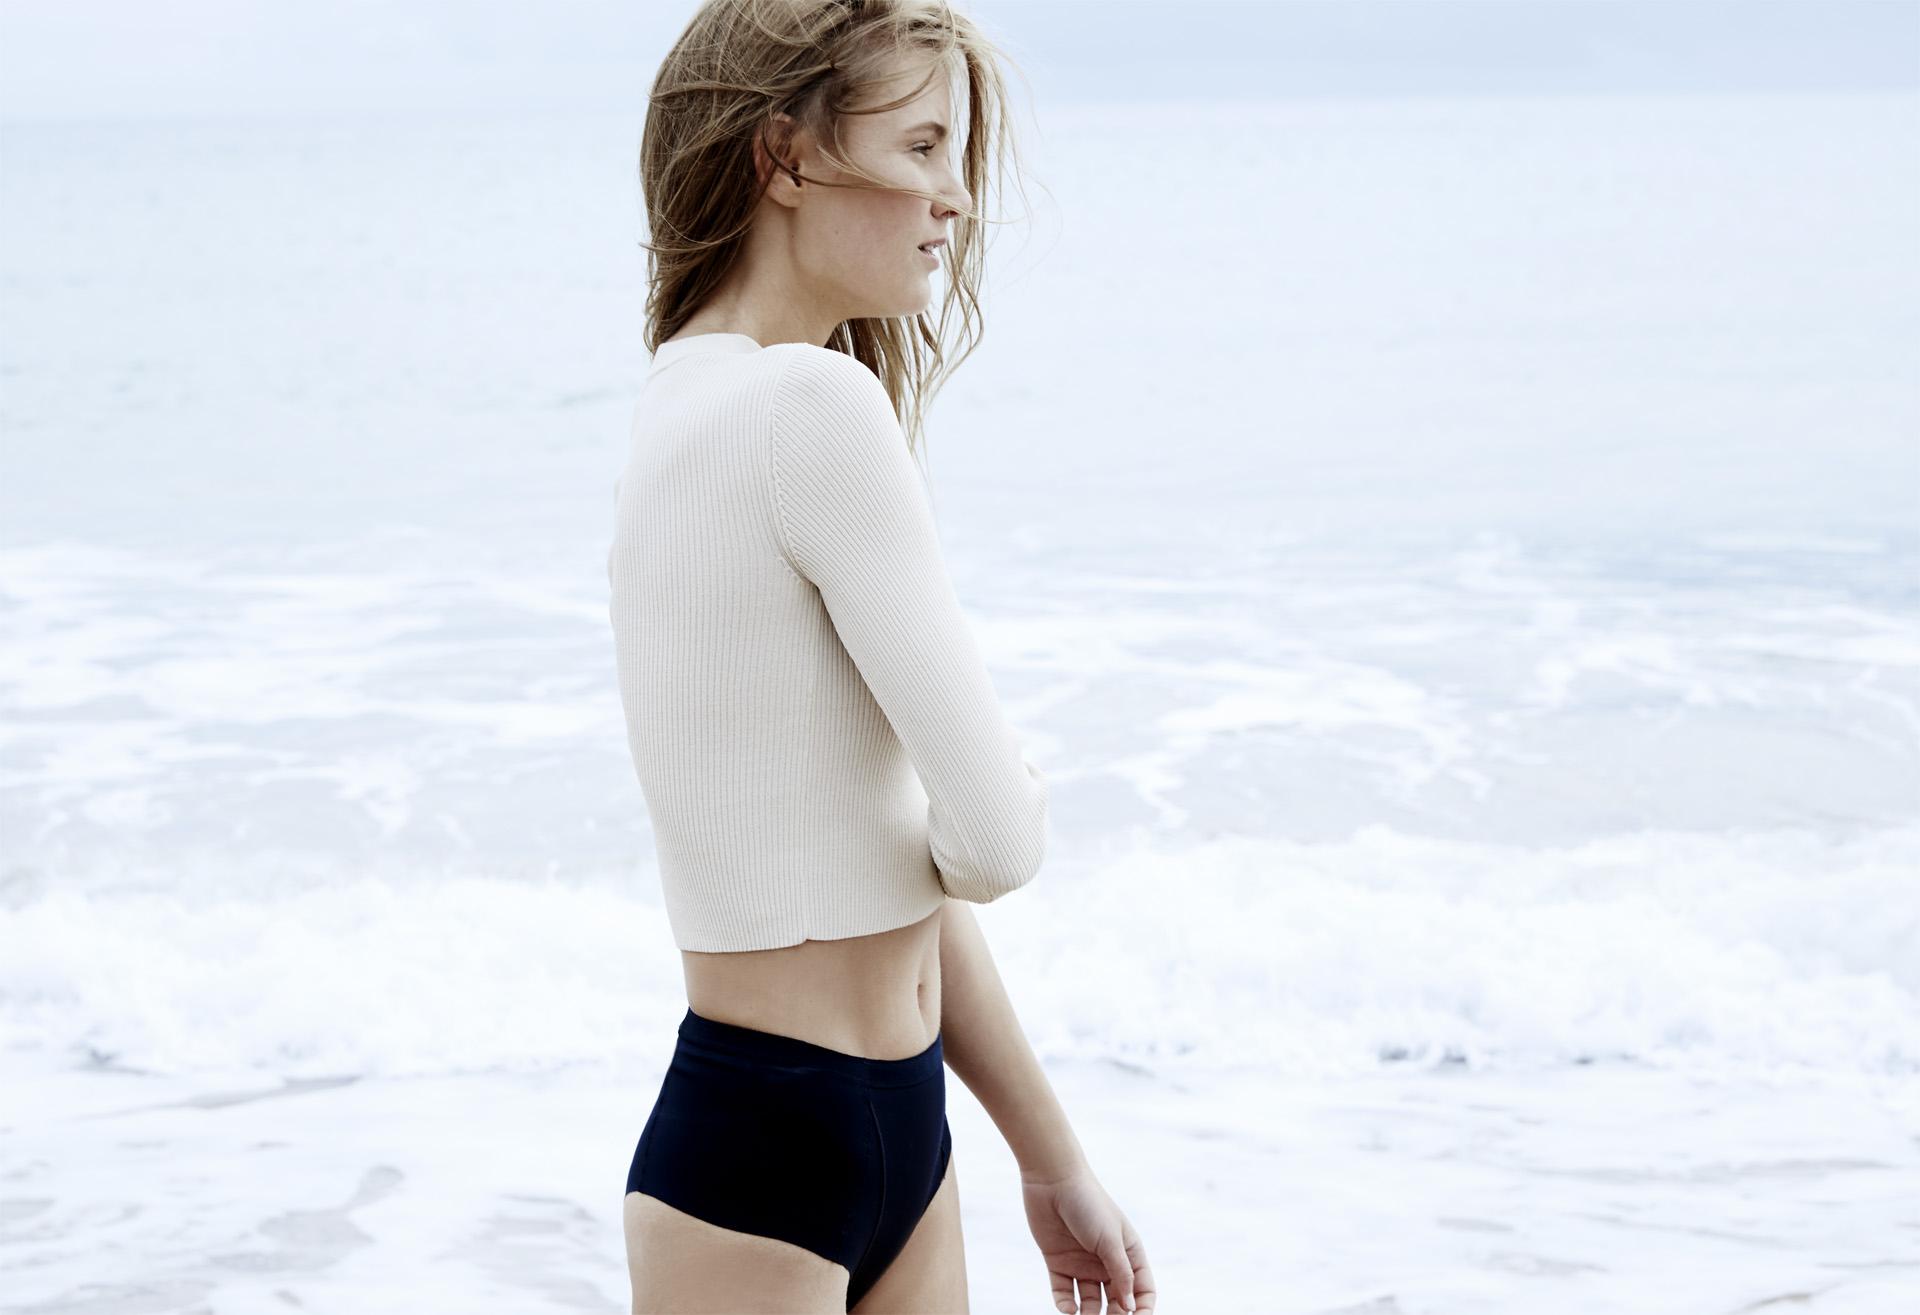 Collection Isle of Women by NOW_THEN eco swimwear / bikini ecológico